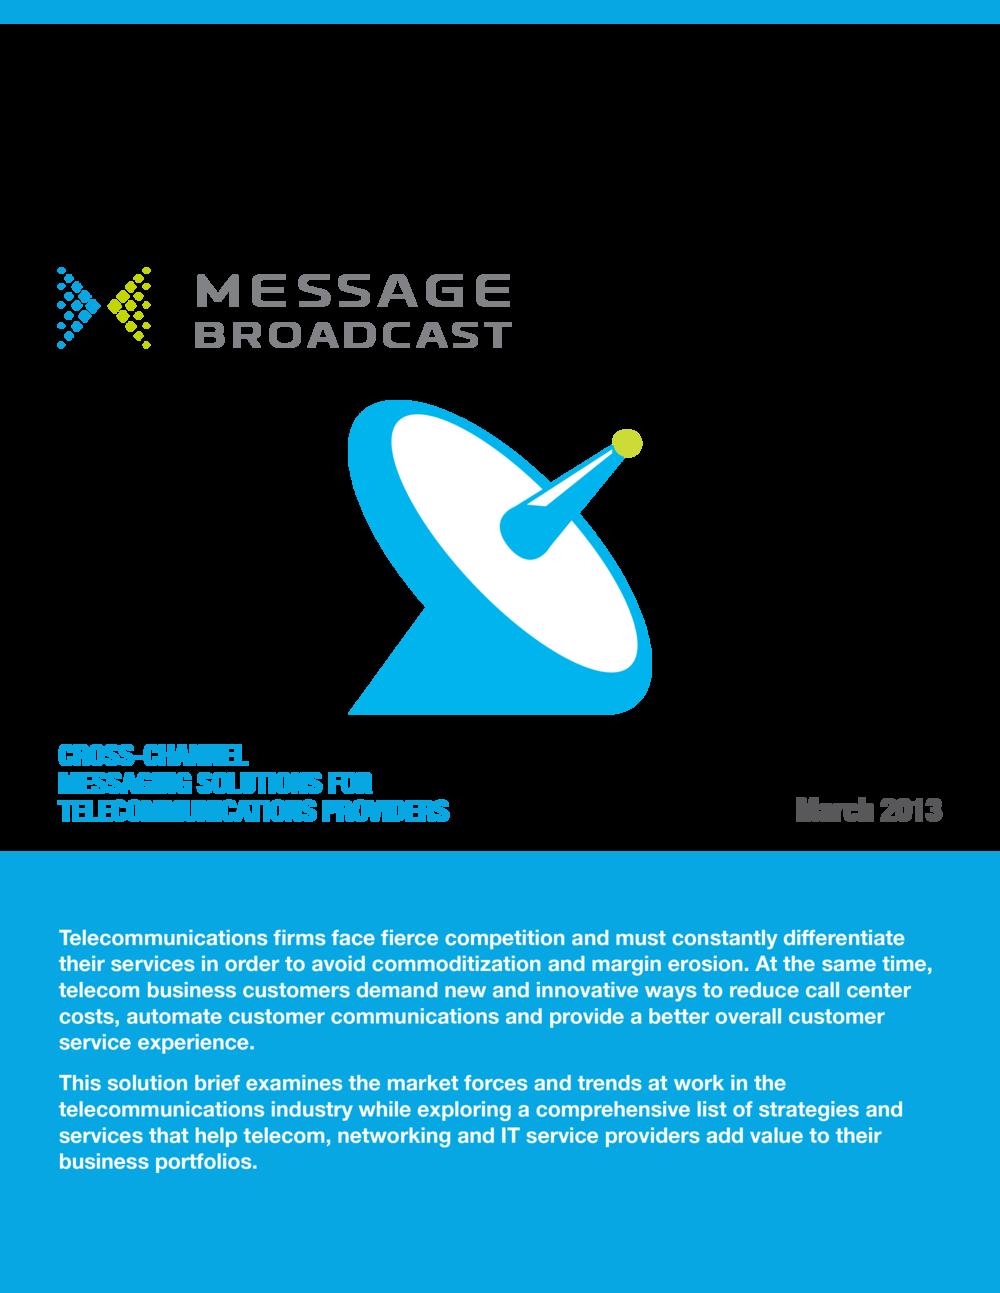 MessageBroadcast White Paper Telecom_FC-1.png